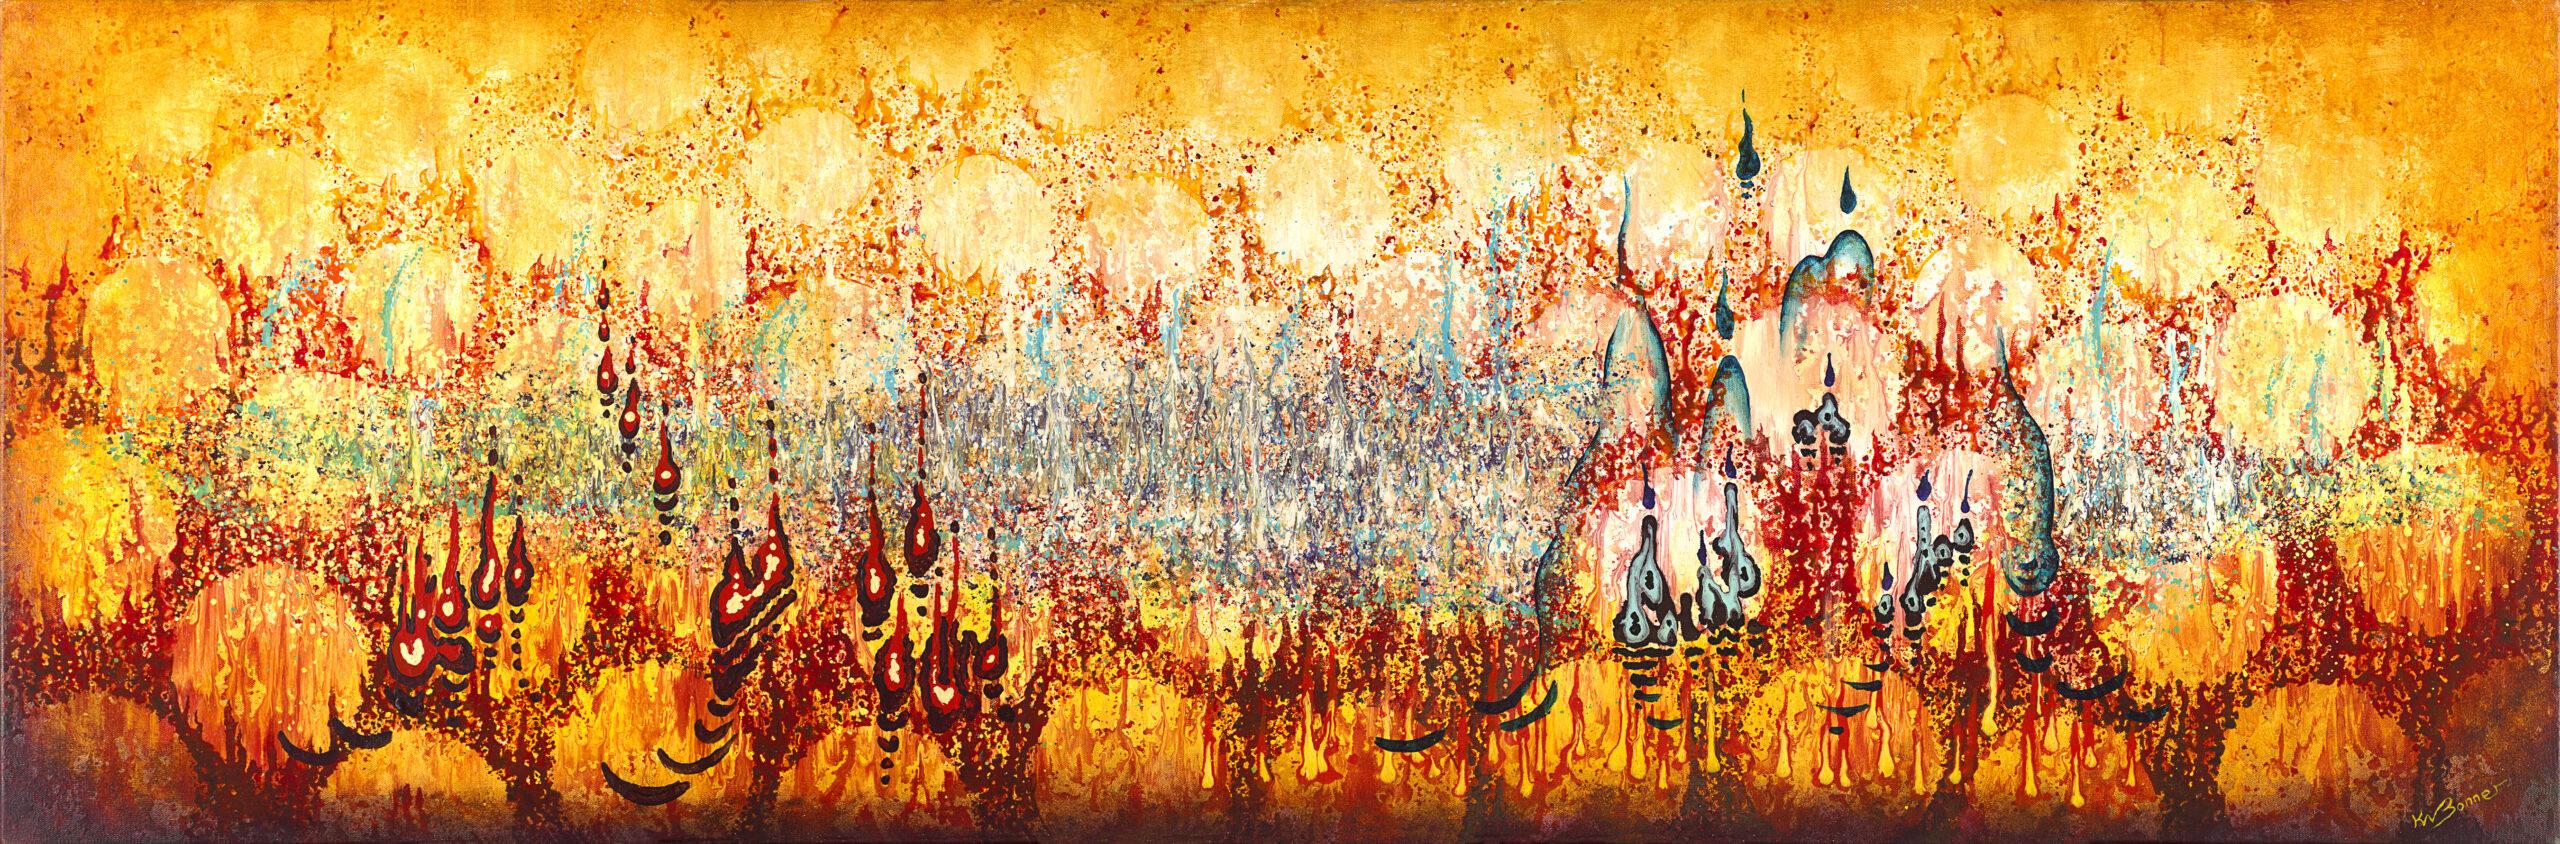 Elemental Meeting - Rebirth | Abstract | Ken Bonner Original Oil Paintings | Santa Fe New Mexico